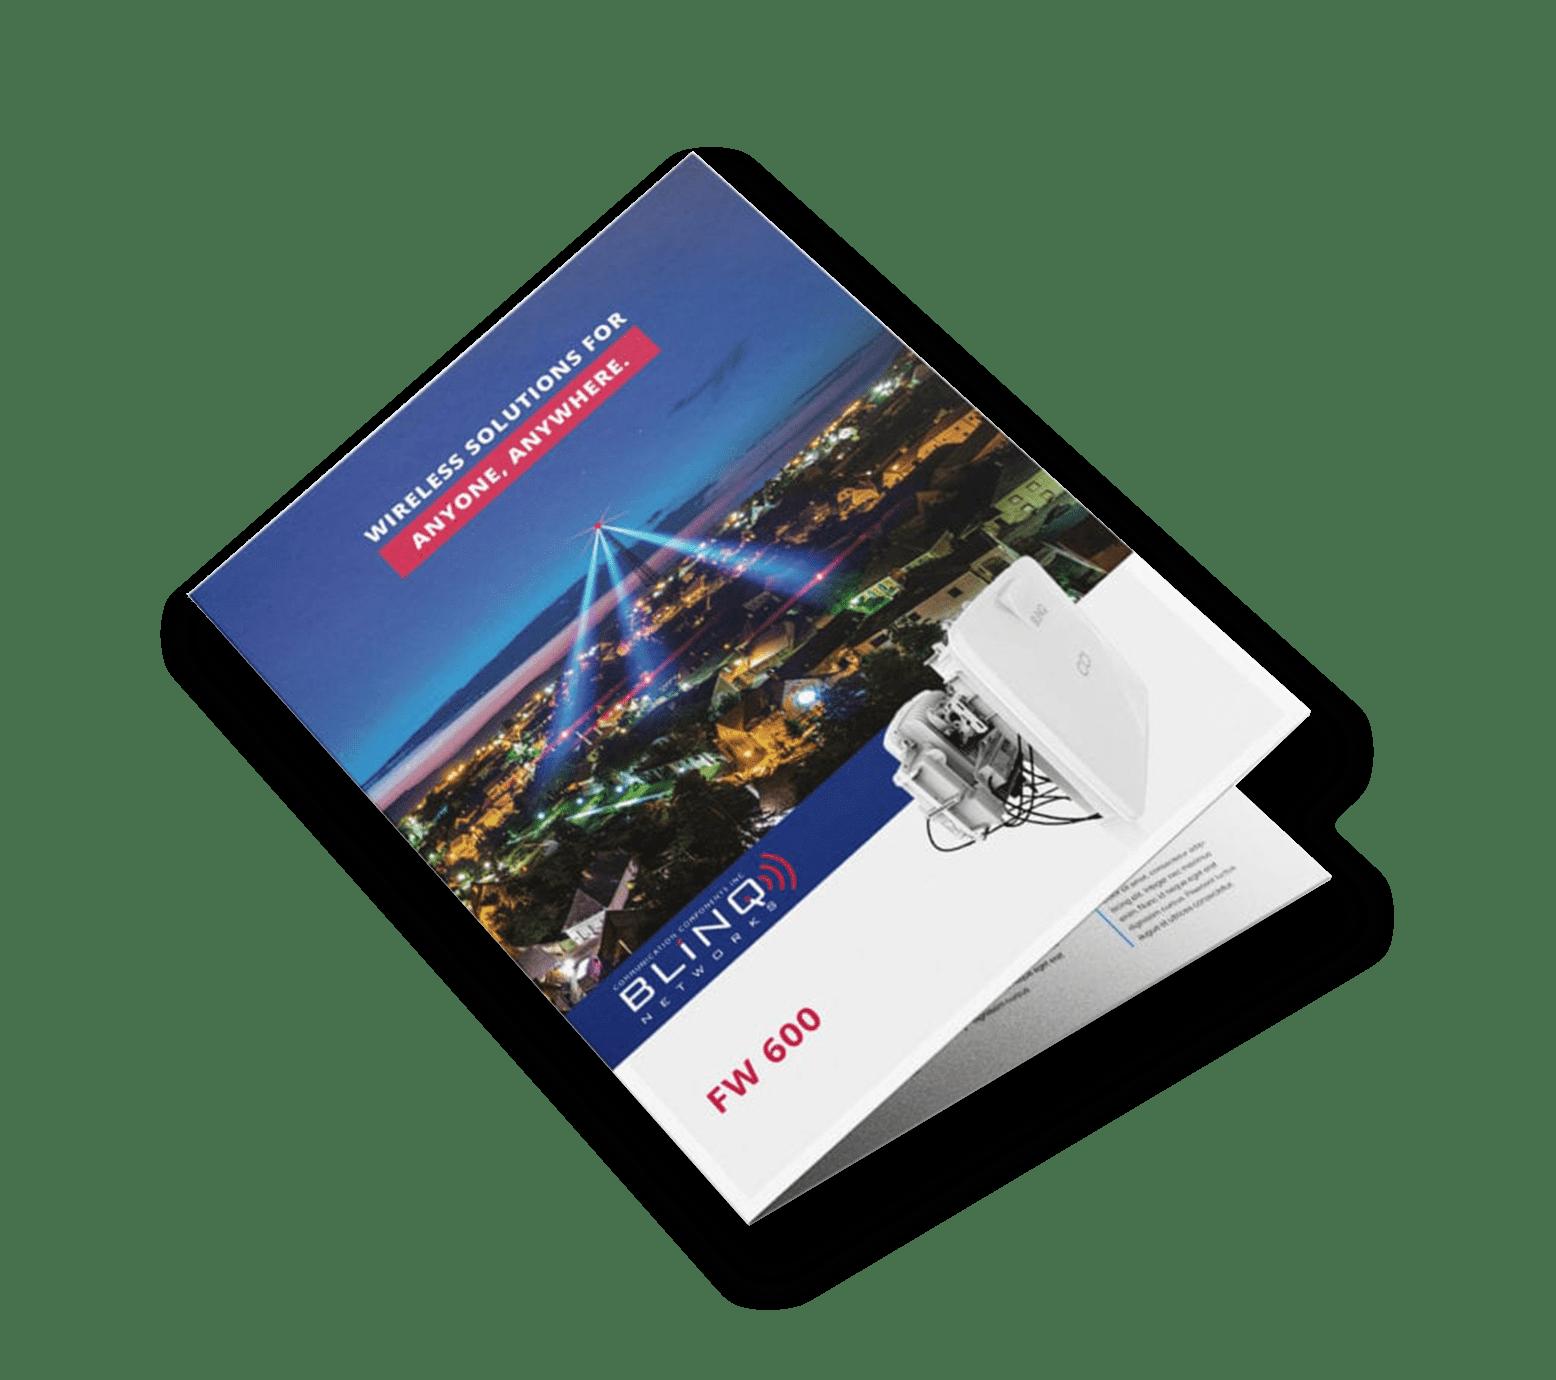 blinq networks fw600 base station specification sheet brochure